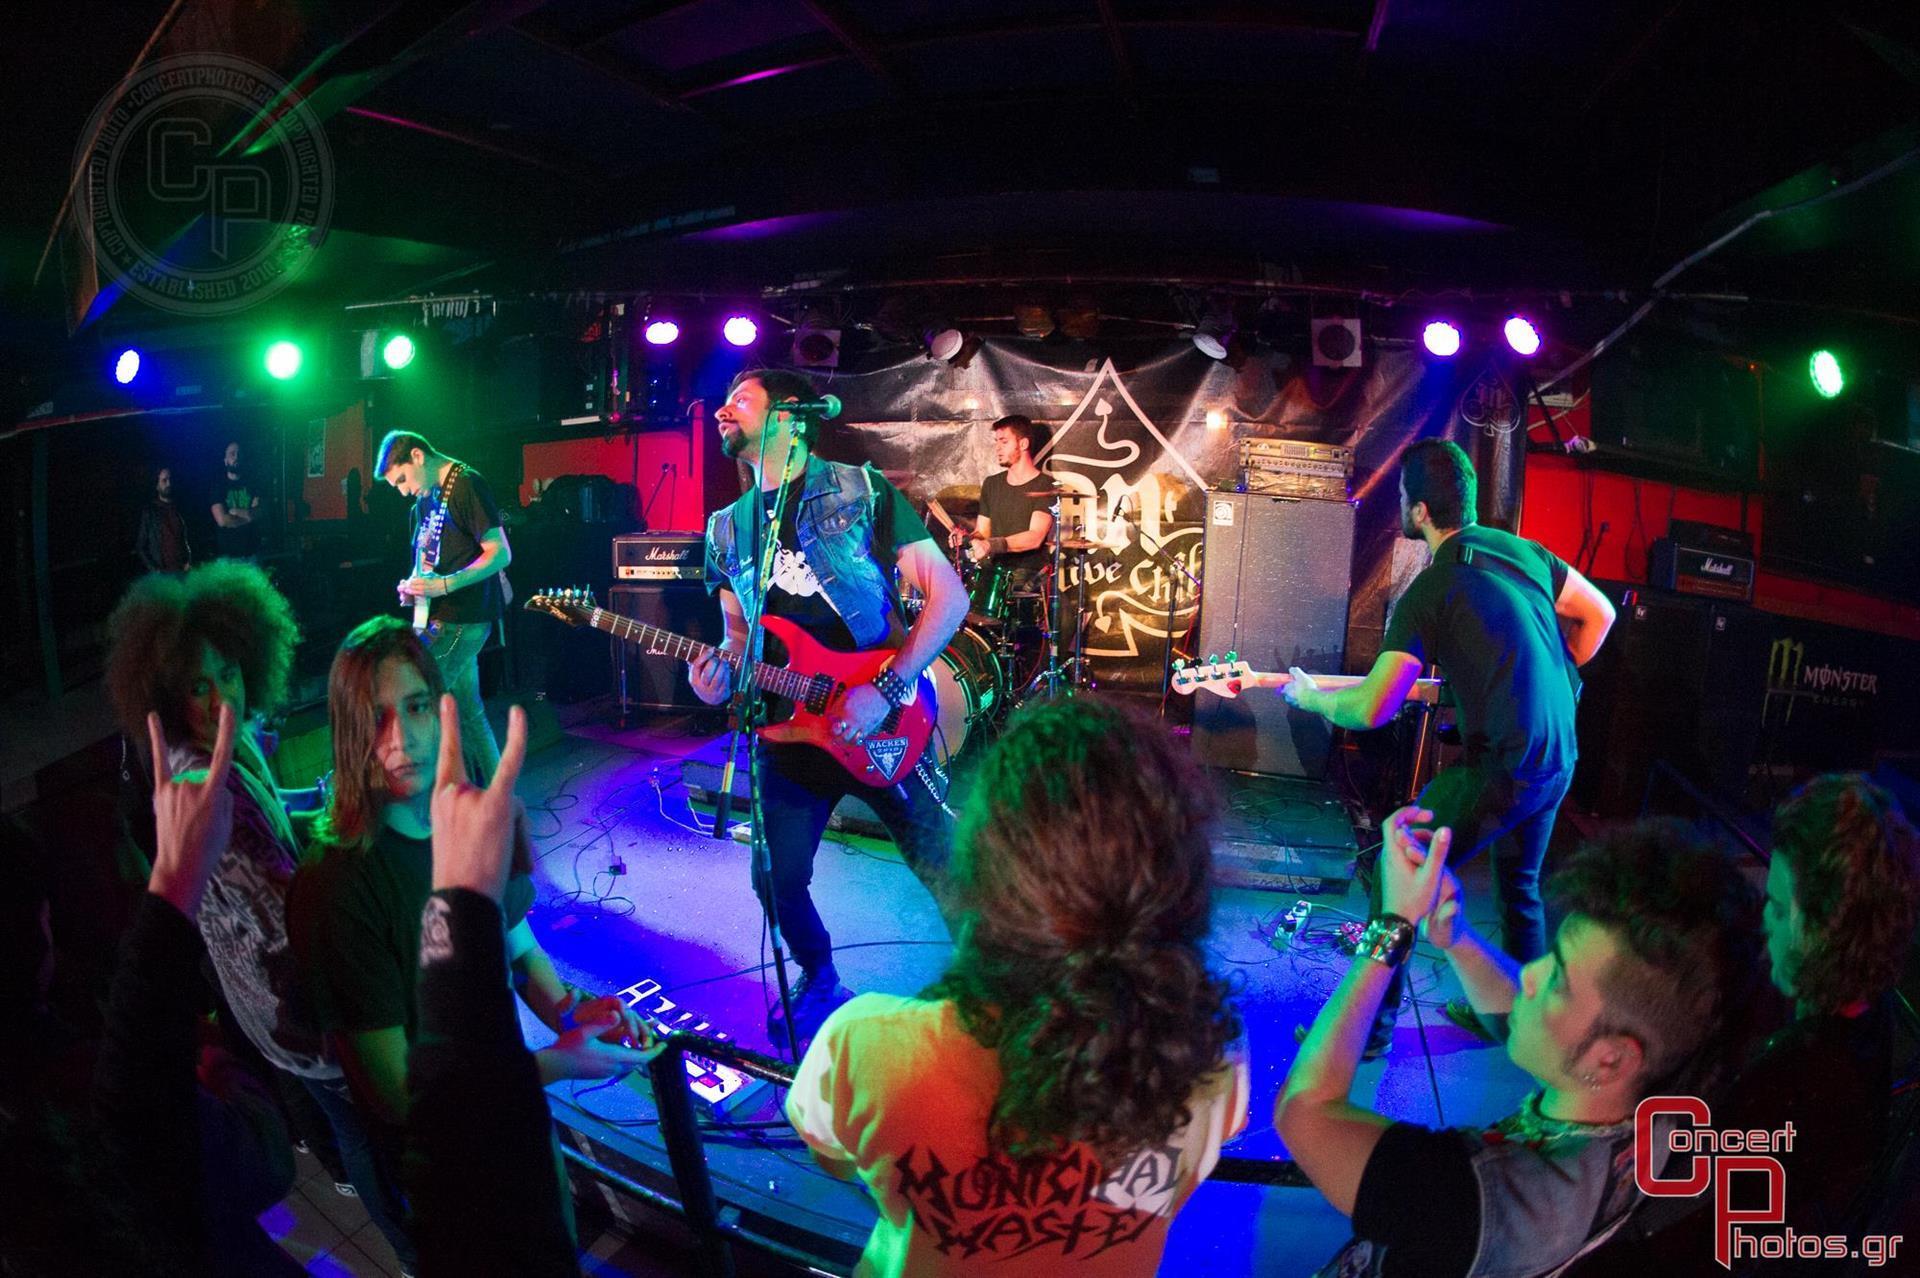 Battle Of The Bands Athens - Leg 3- photographer:  - ConcertPhotos - 20150104_2235_20